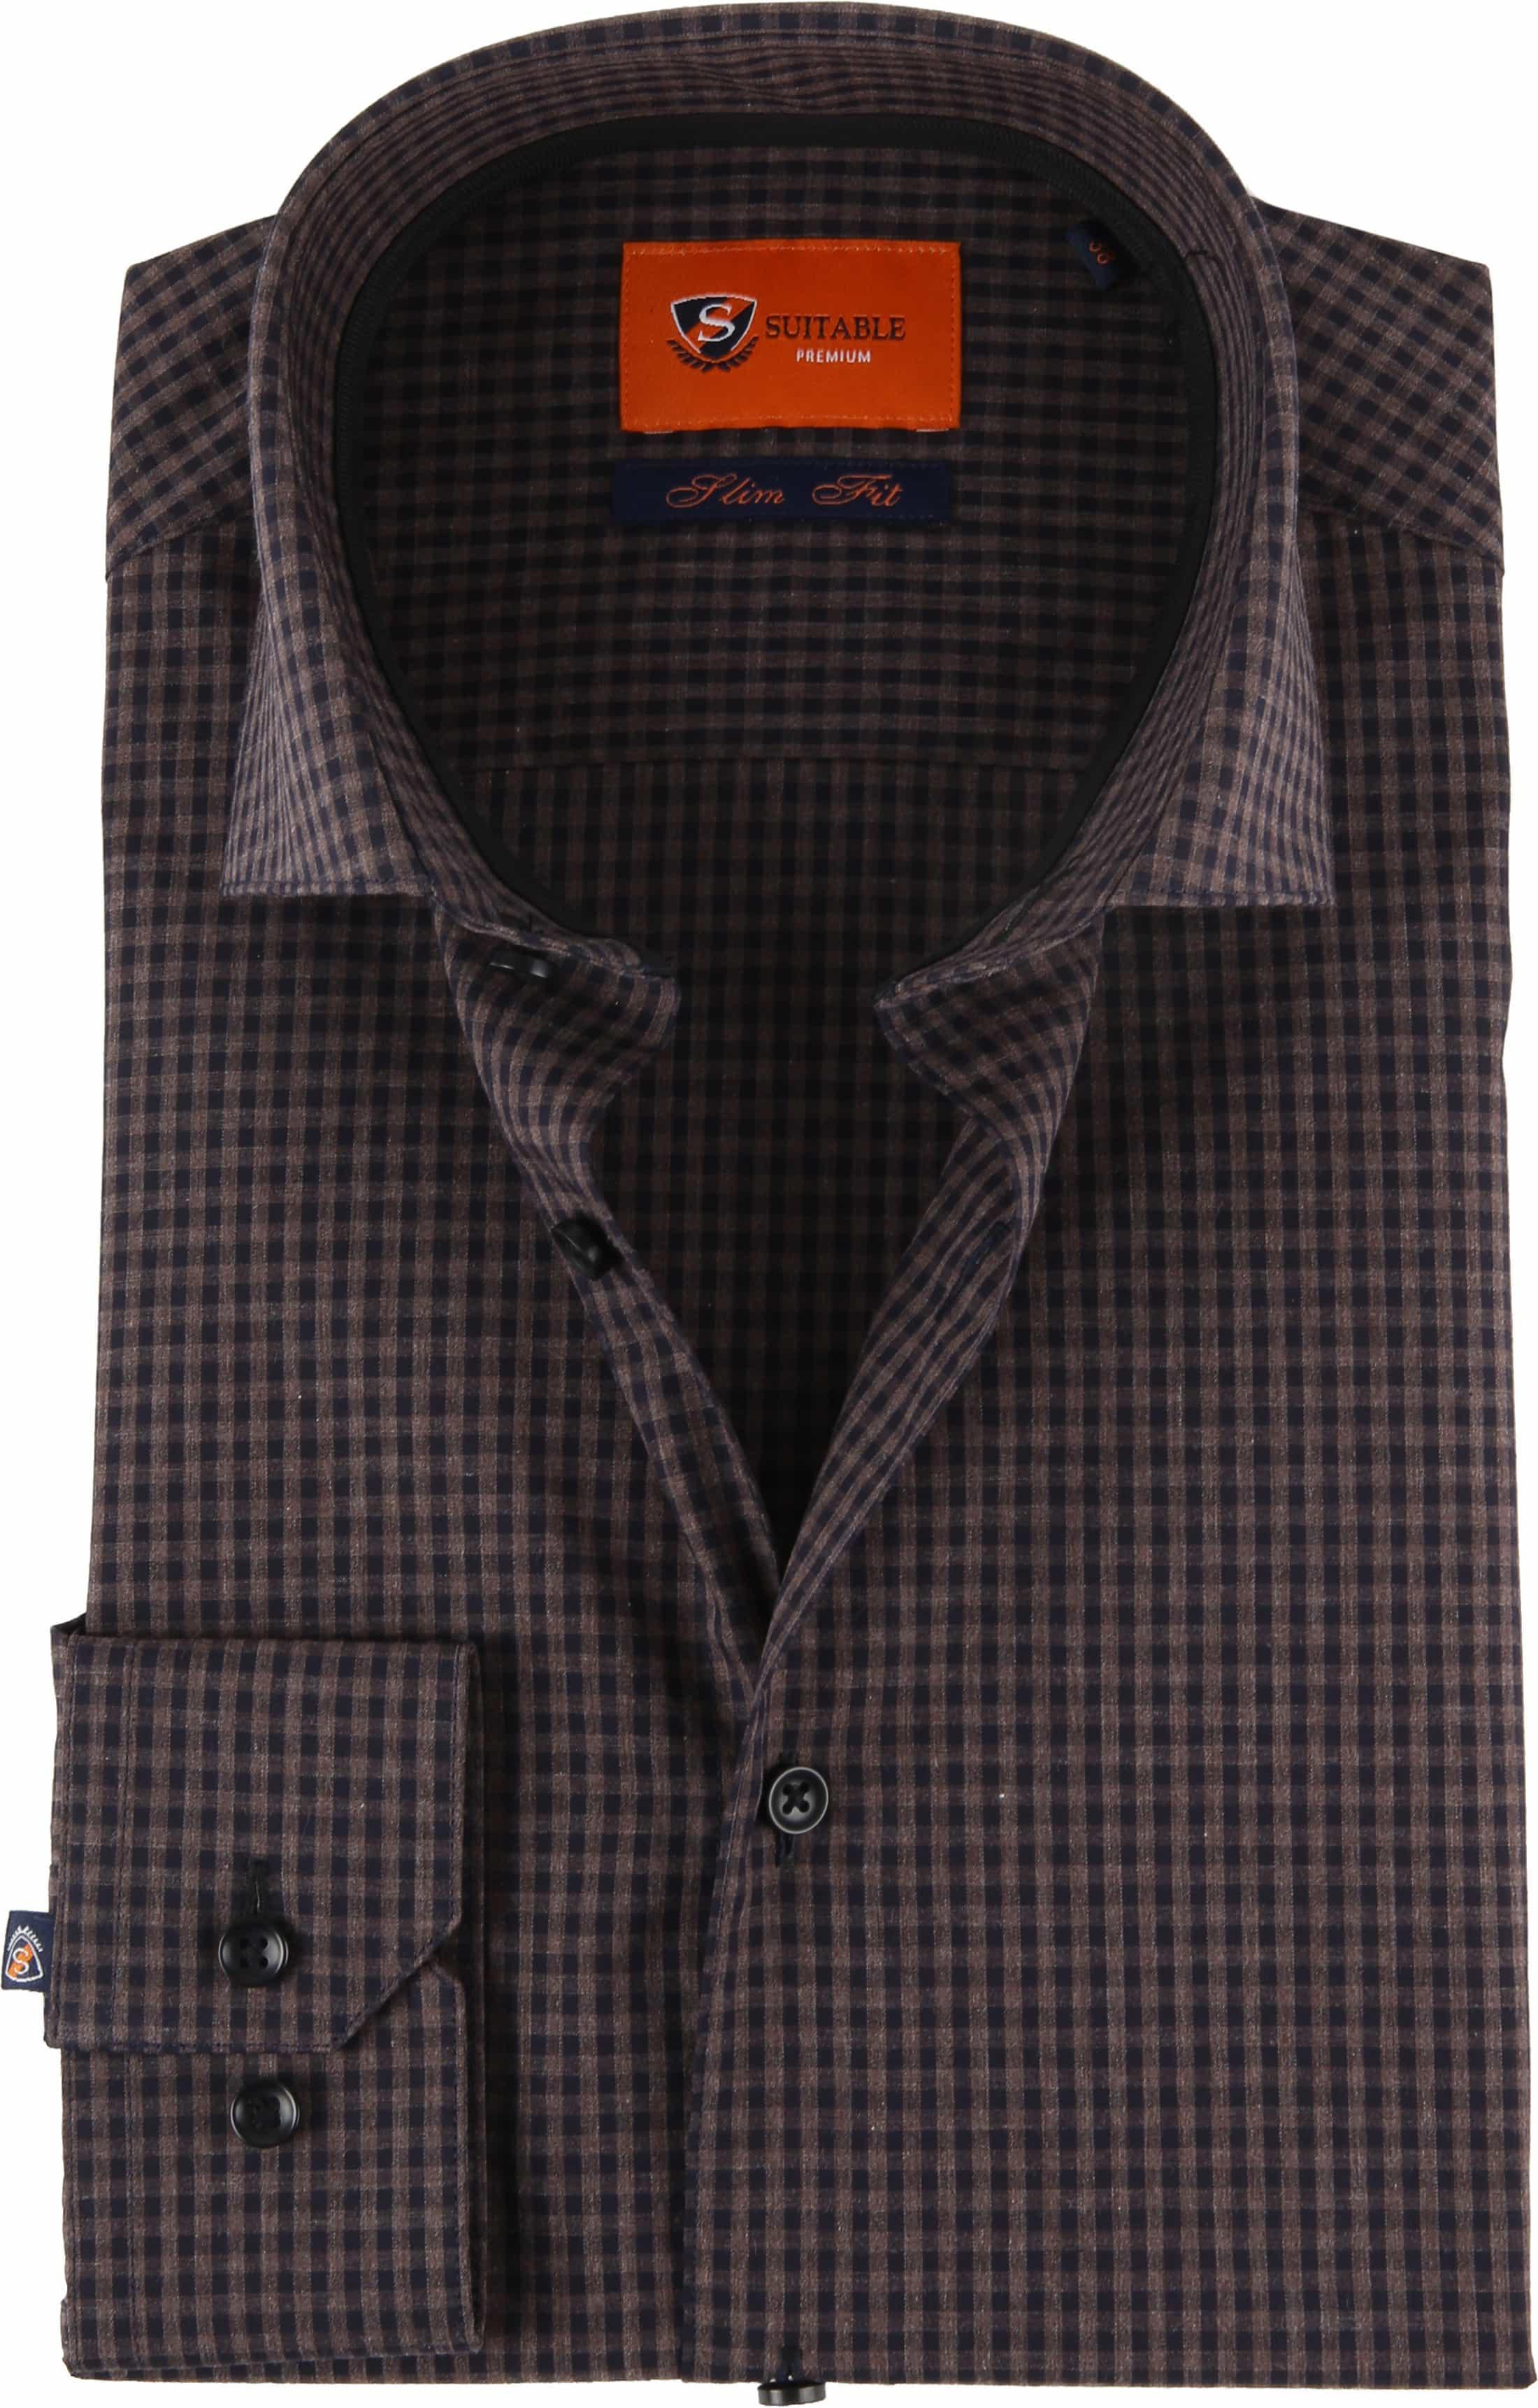 Suitable Shirt Vichy Checks Brown foto 0